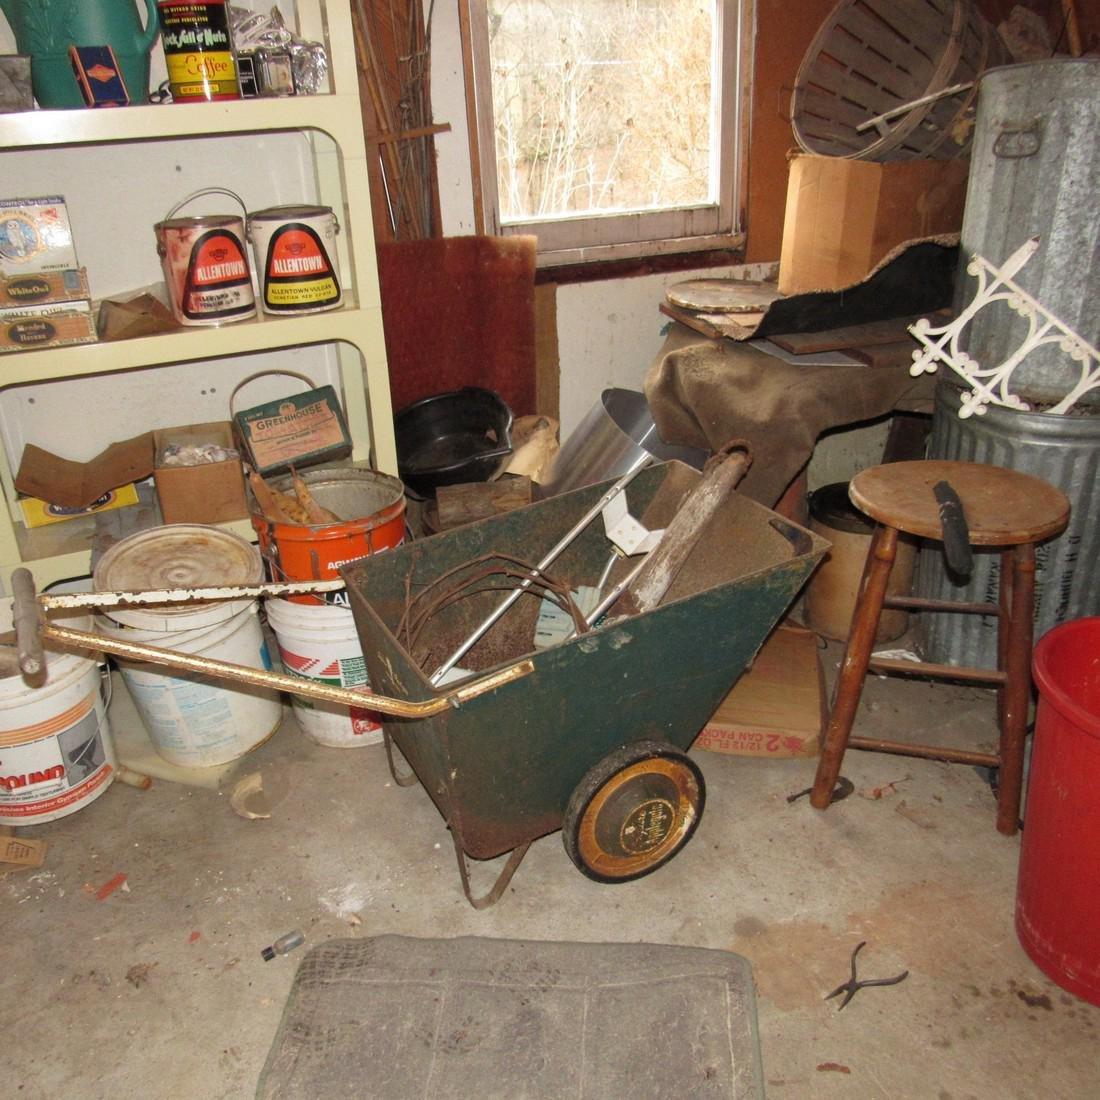 Partial Garage Contents - 2